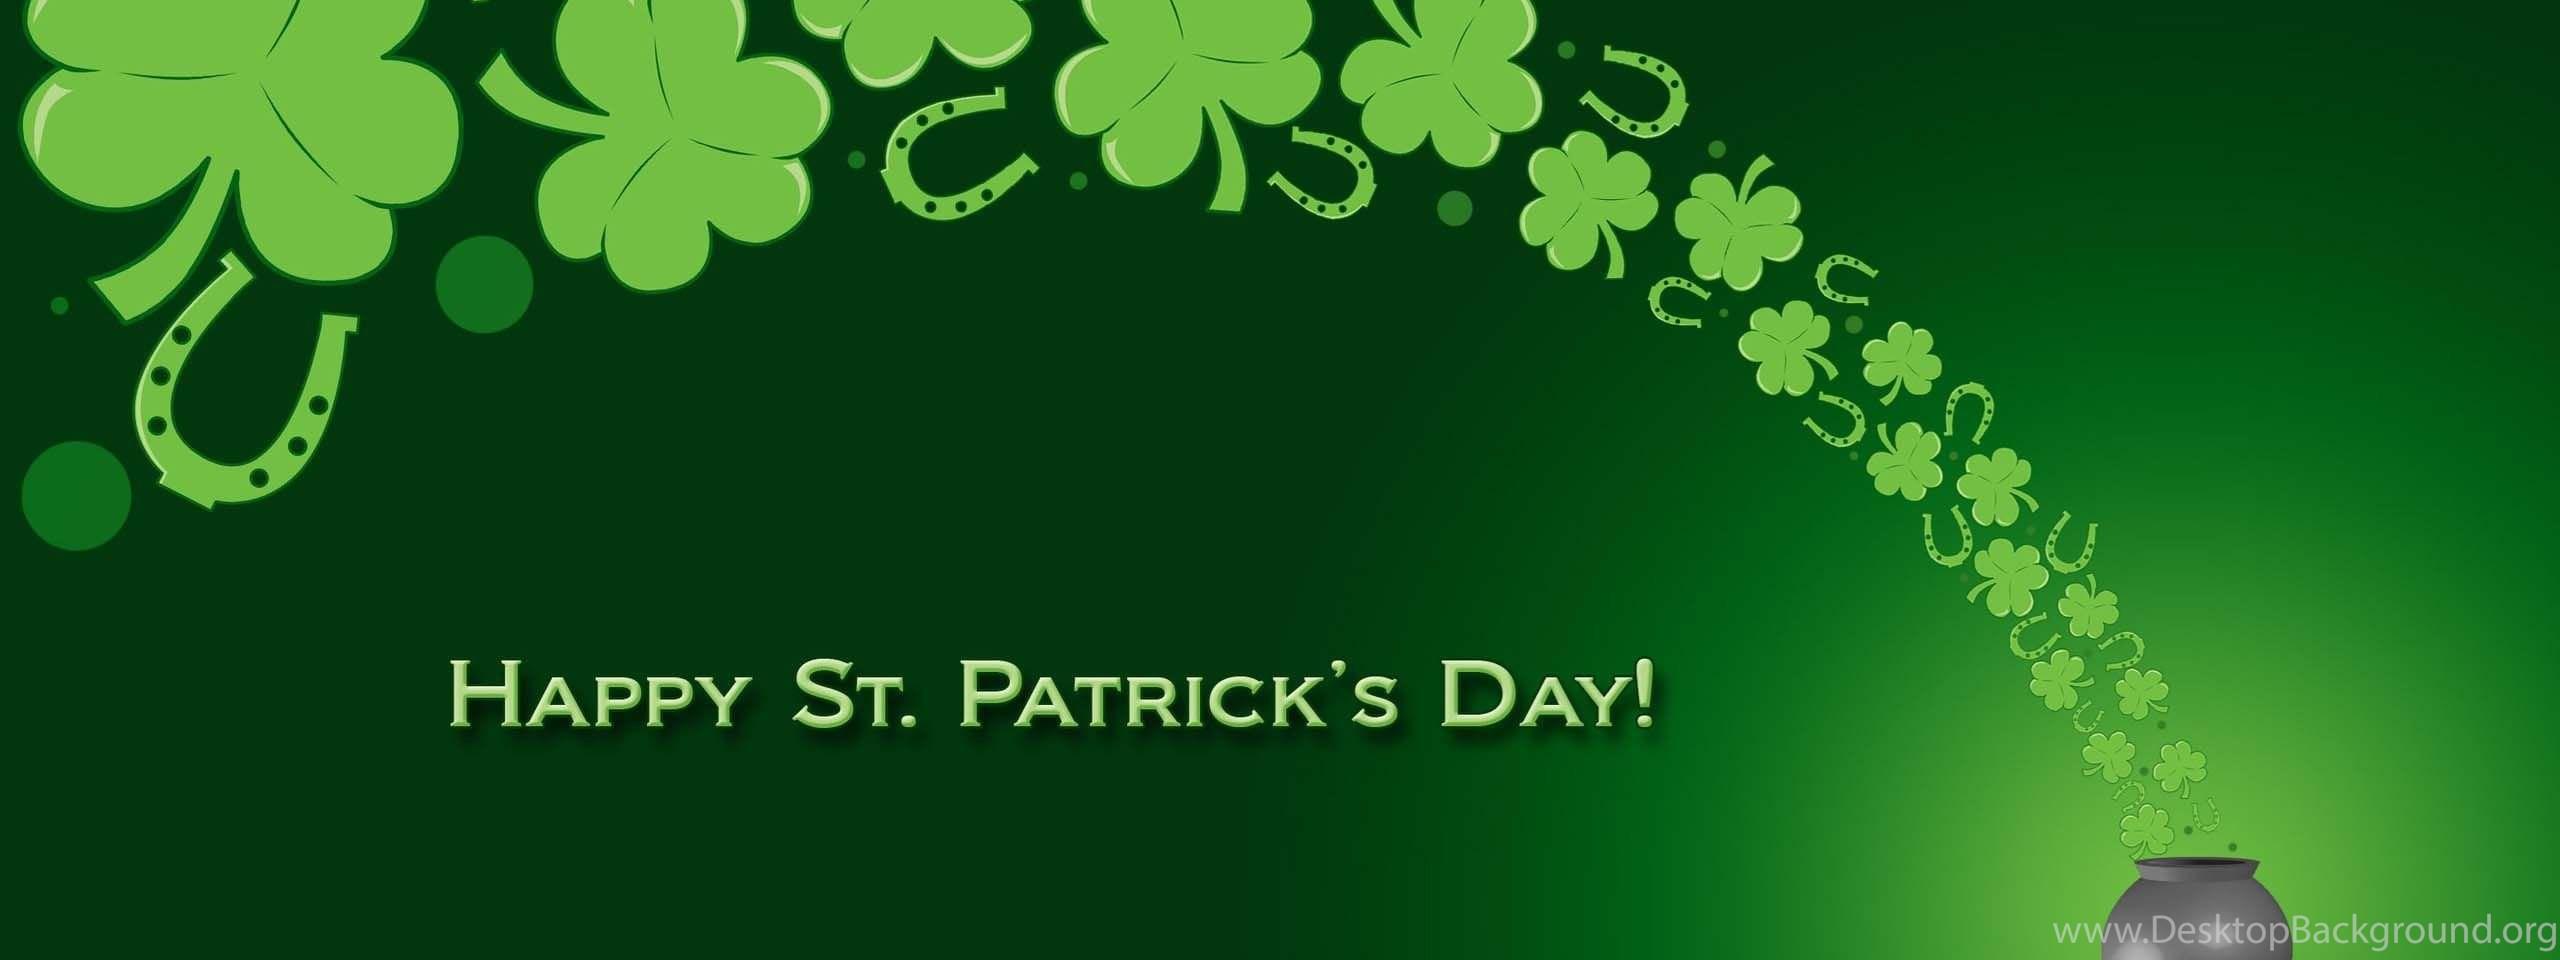 Happy St Patricks Day Wallpaper 81 5 Jpg Desktop Background